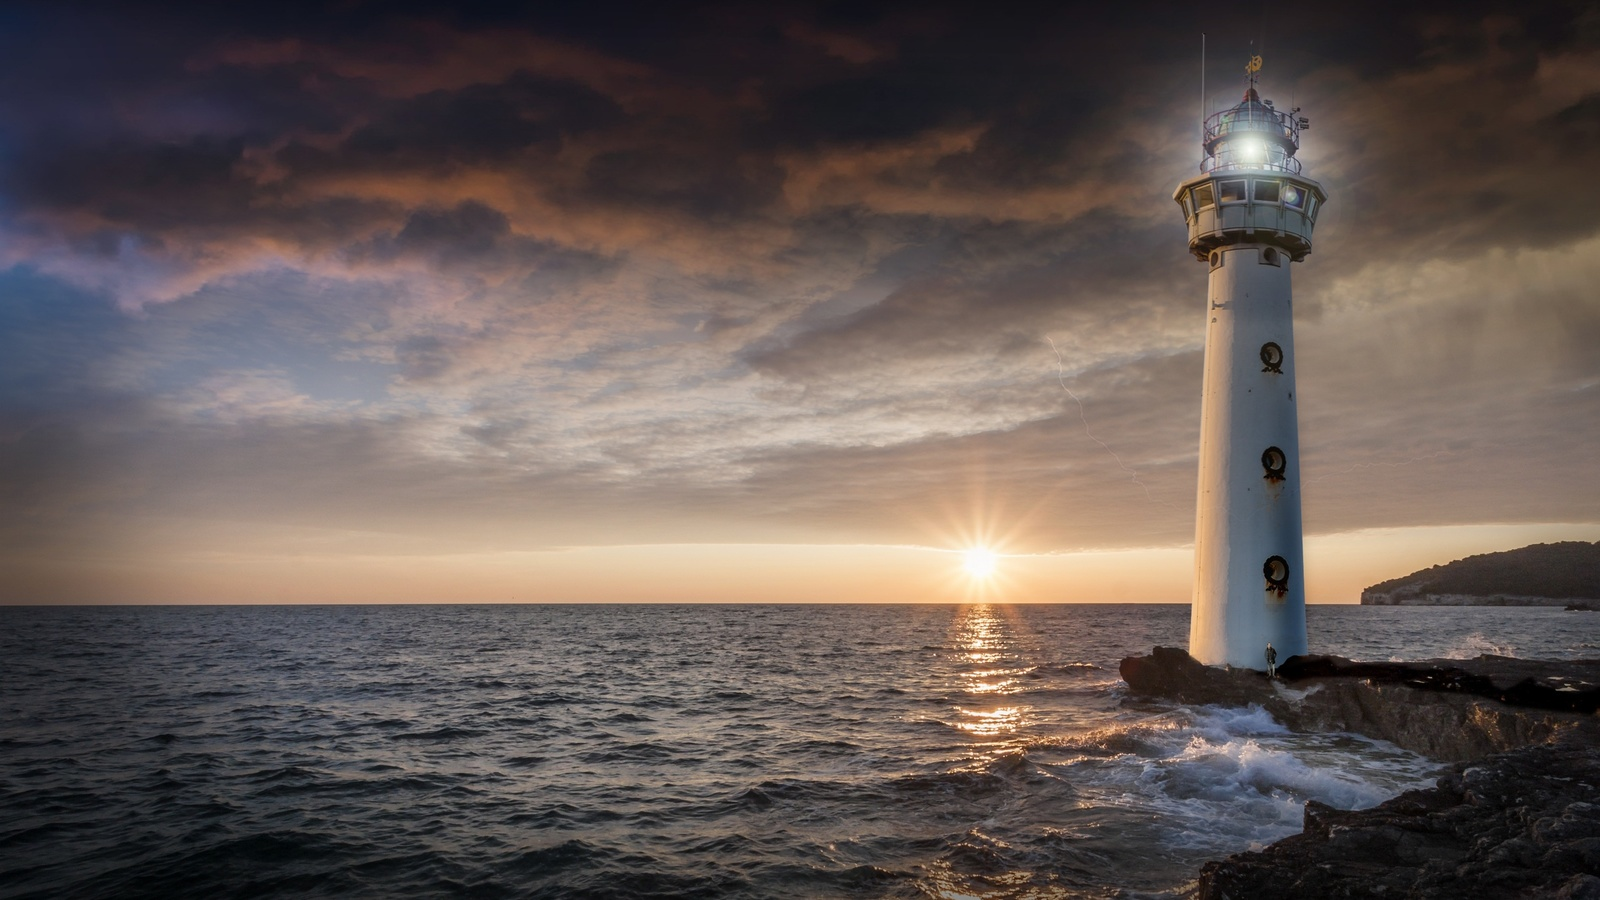 море, берег, камни, маяк, свет, солнце, лучи, закат